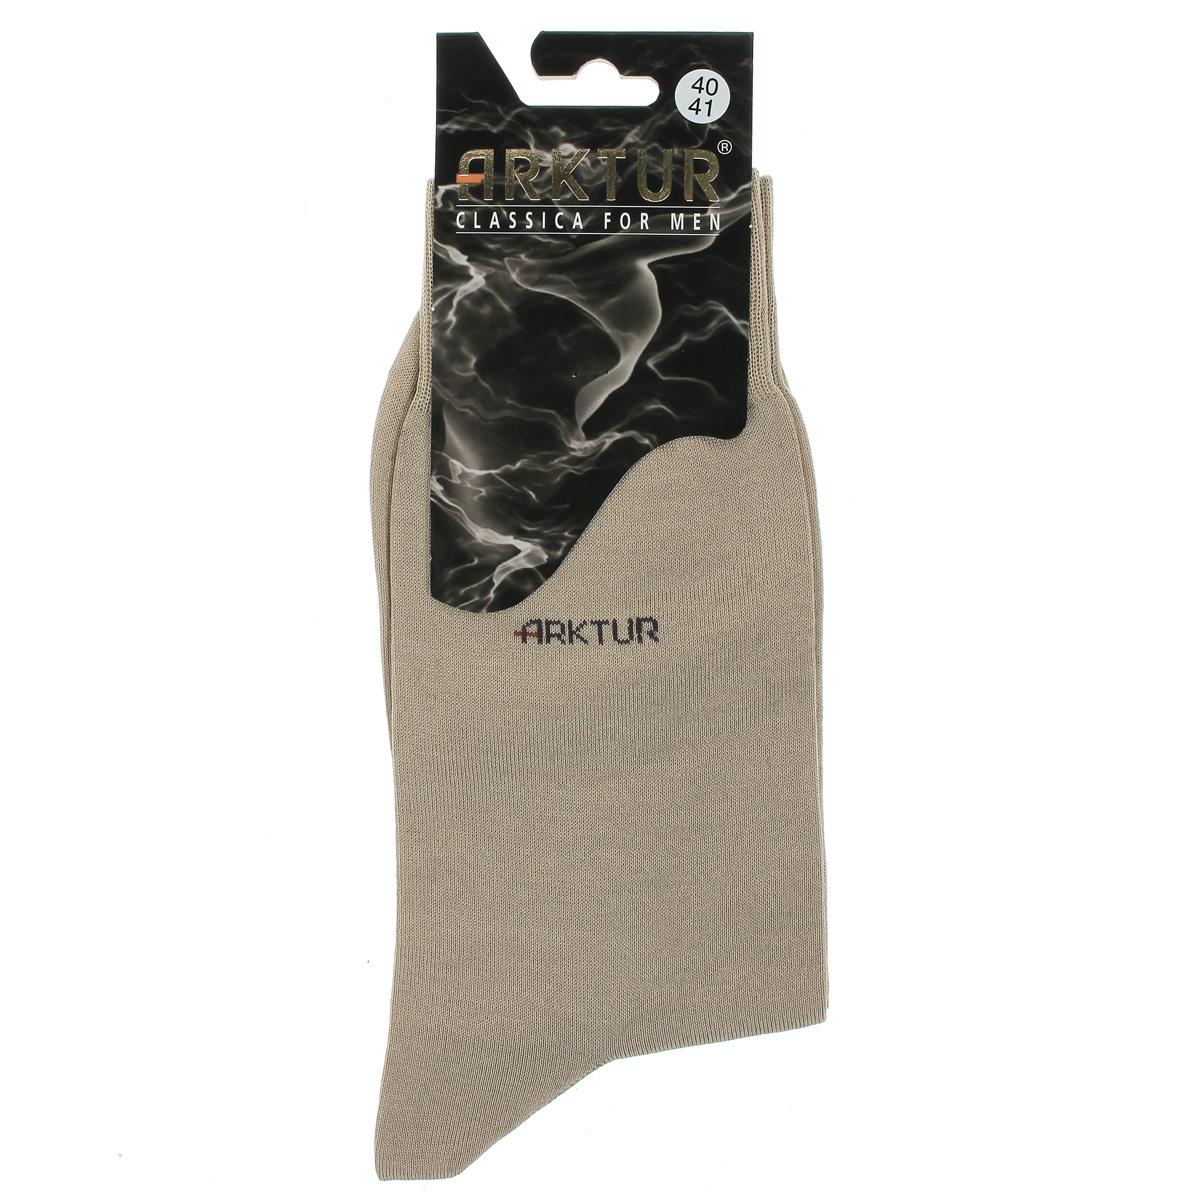 Носки мужские Arktur, цвет: светло-бежевый. Л150. Размер 40/41 arktur носки